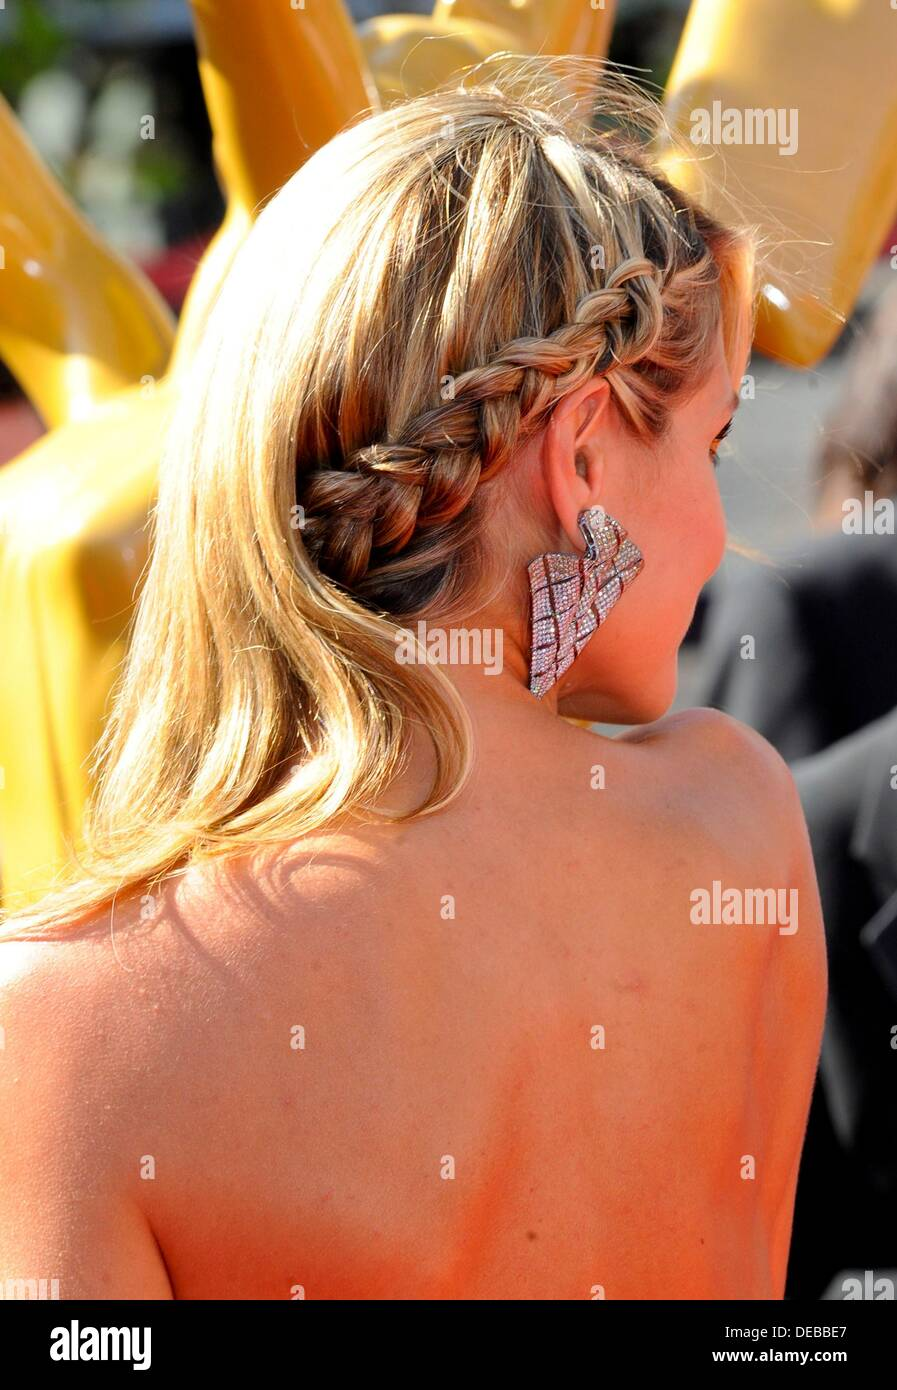 Los Angeles, CA. 15th Sep, 2013. Heidi Klum at arrivals for Primetime Emmy Awards: Creative Arts Awards - ARRIVALS, - Stock Image